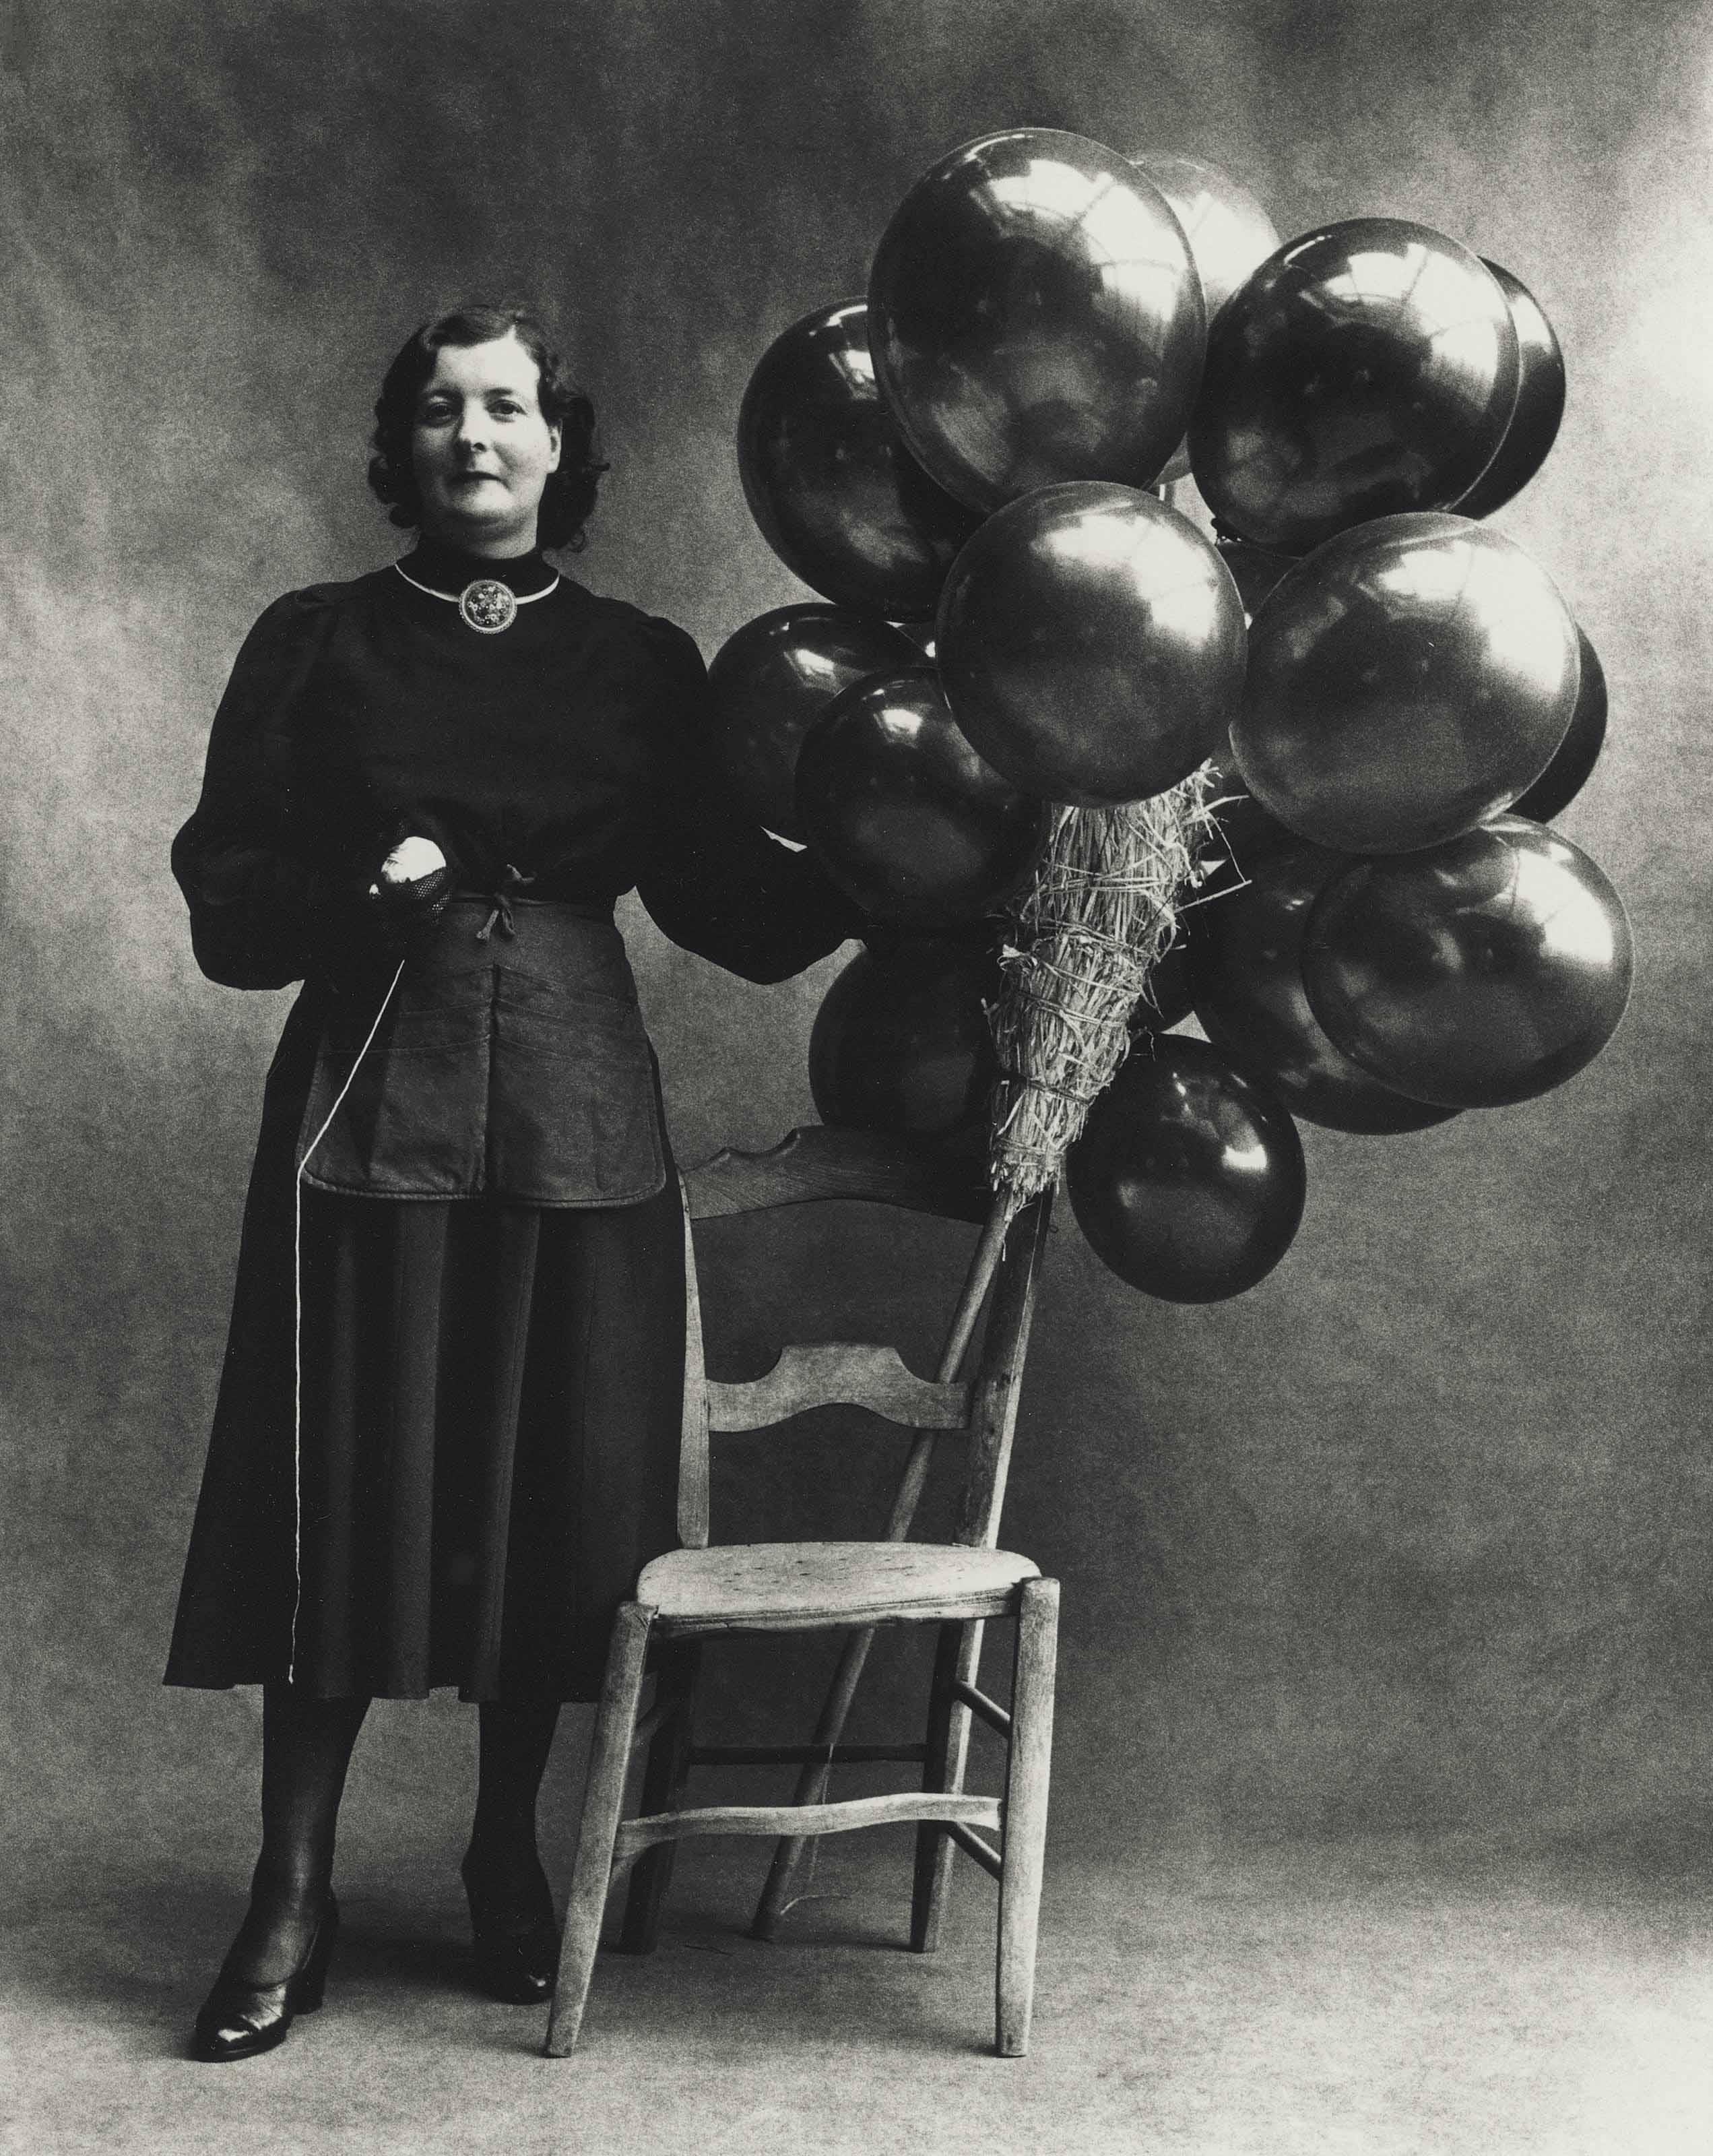 PENN La vendeuse de ballons